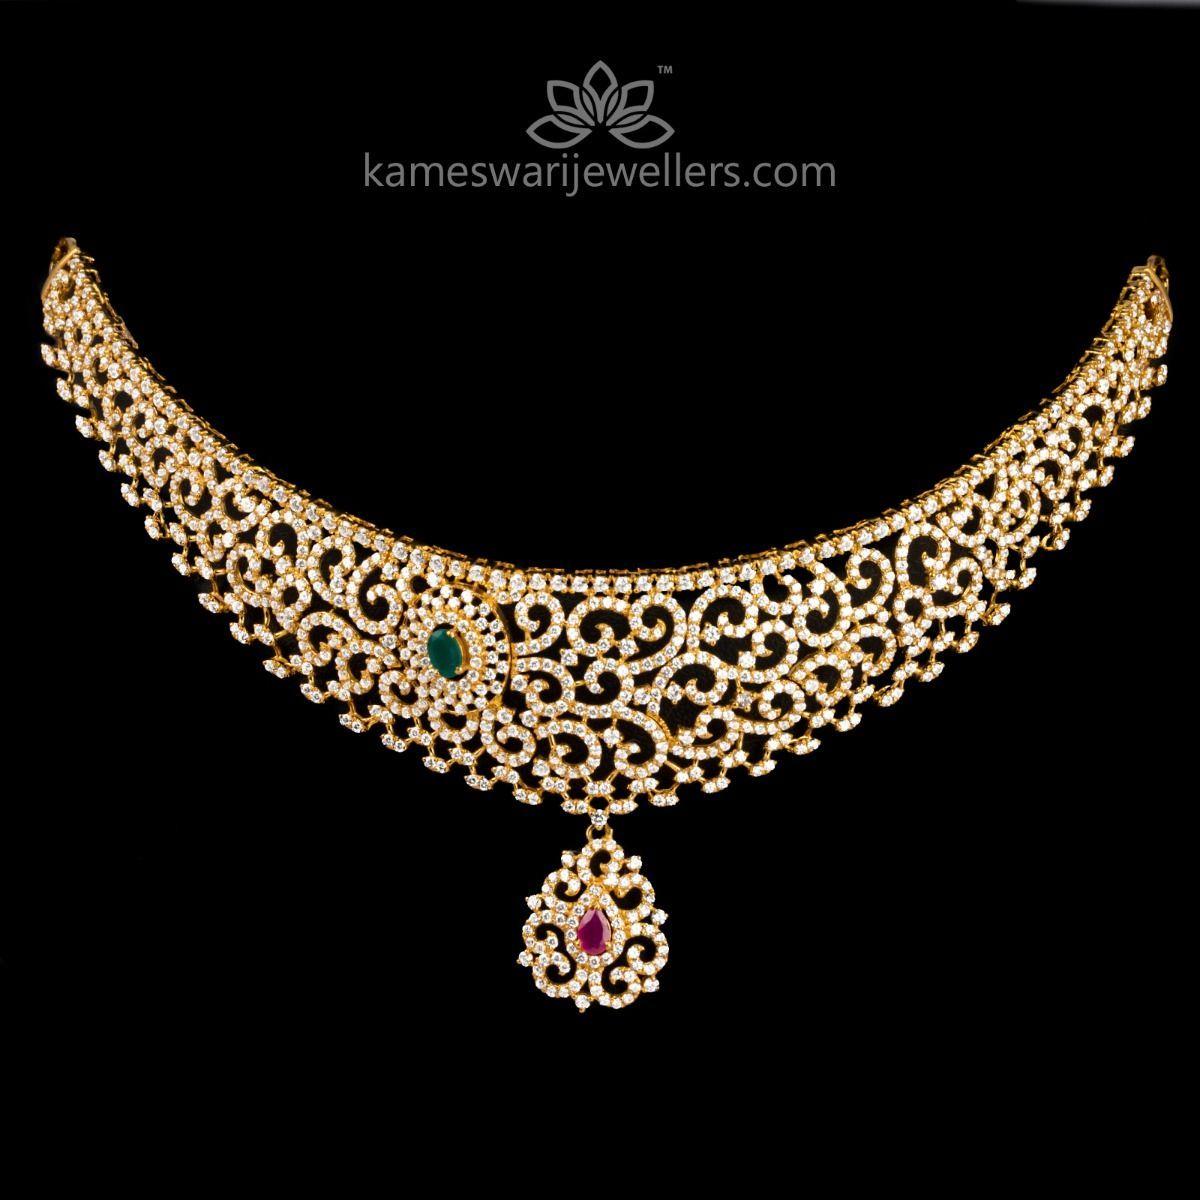 Buy Necklaces Online Flexible Cz Choker From Kameswari Jewellers We Ship Across India And U Necklace Online Diamond Necklace Designs Jewelry Collection